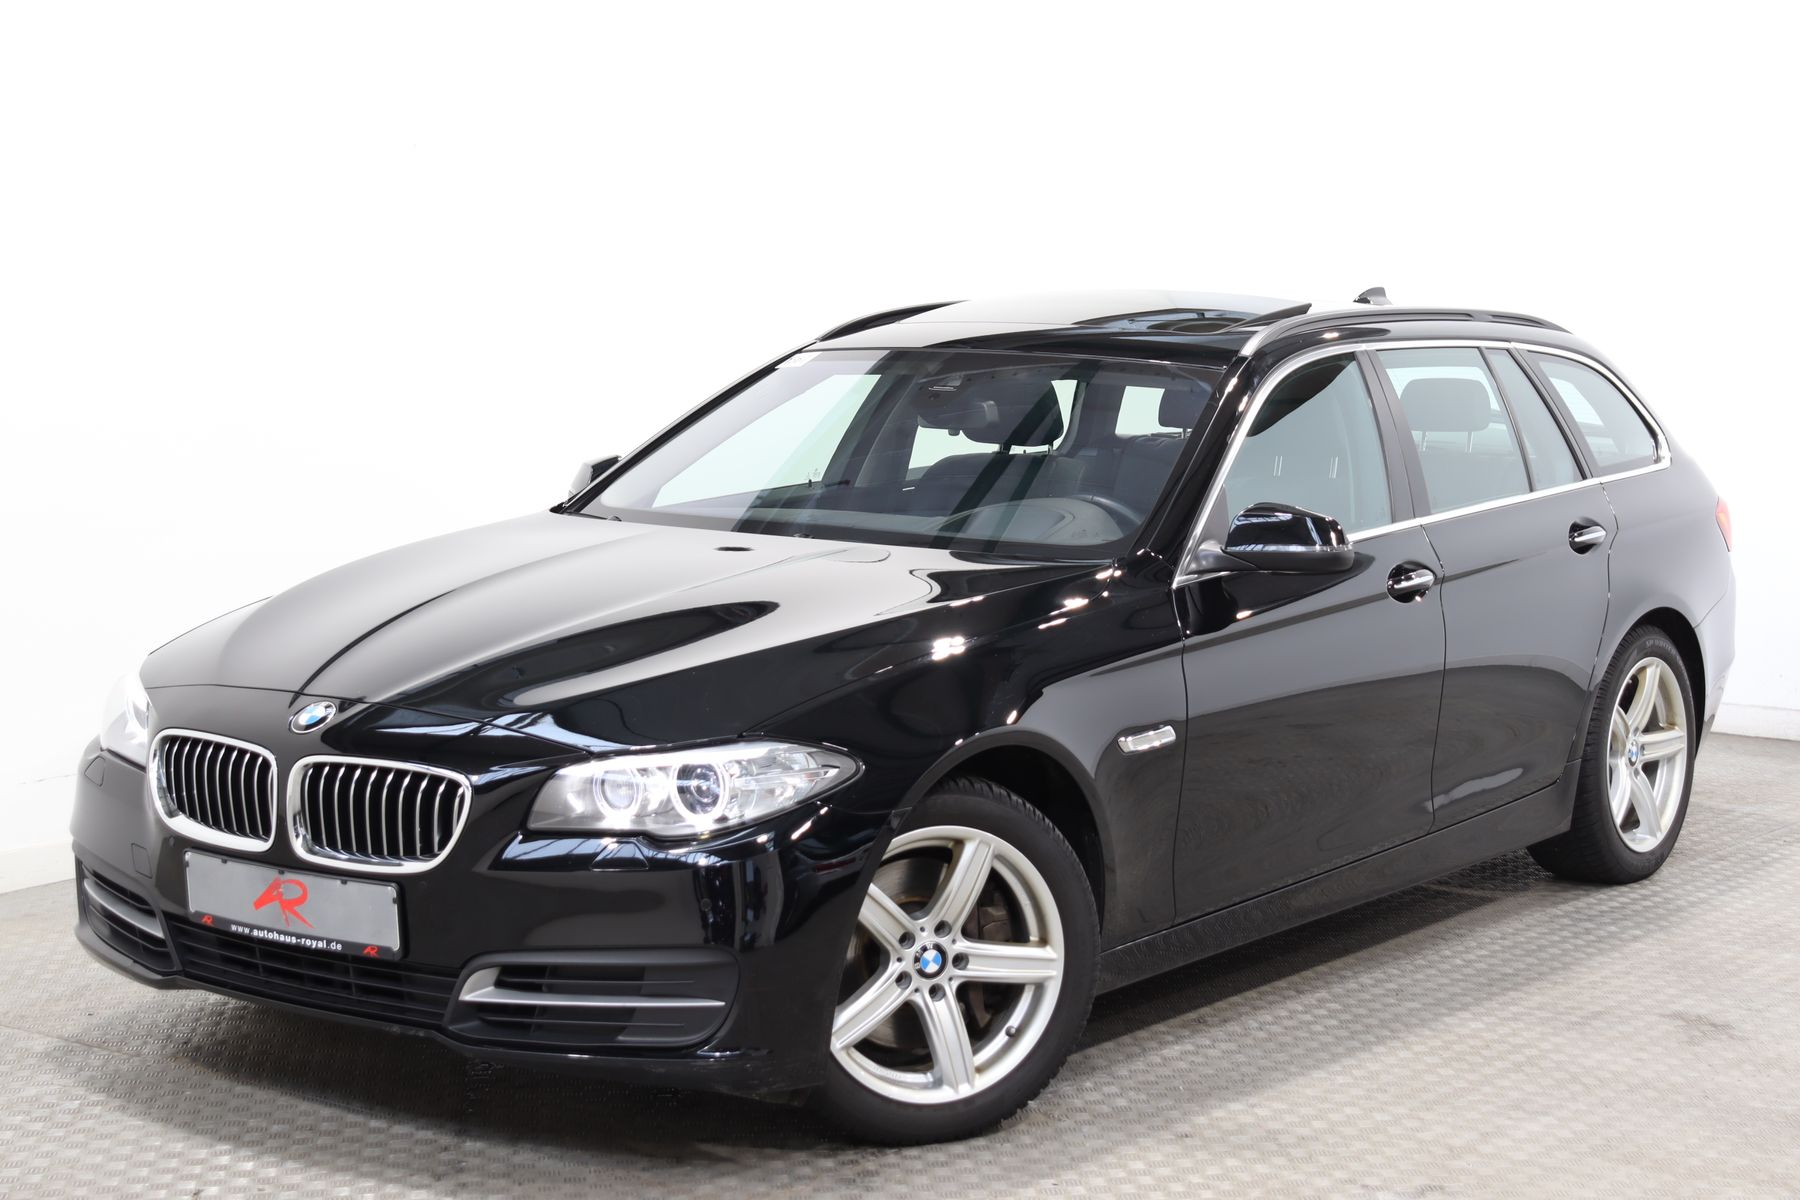 BMW 535 d xDrive STANDHEIZ,MEMORY,KAMERA,SOUNDSYSTEM, Jahr 2016, Diesel